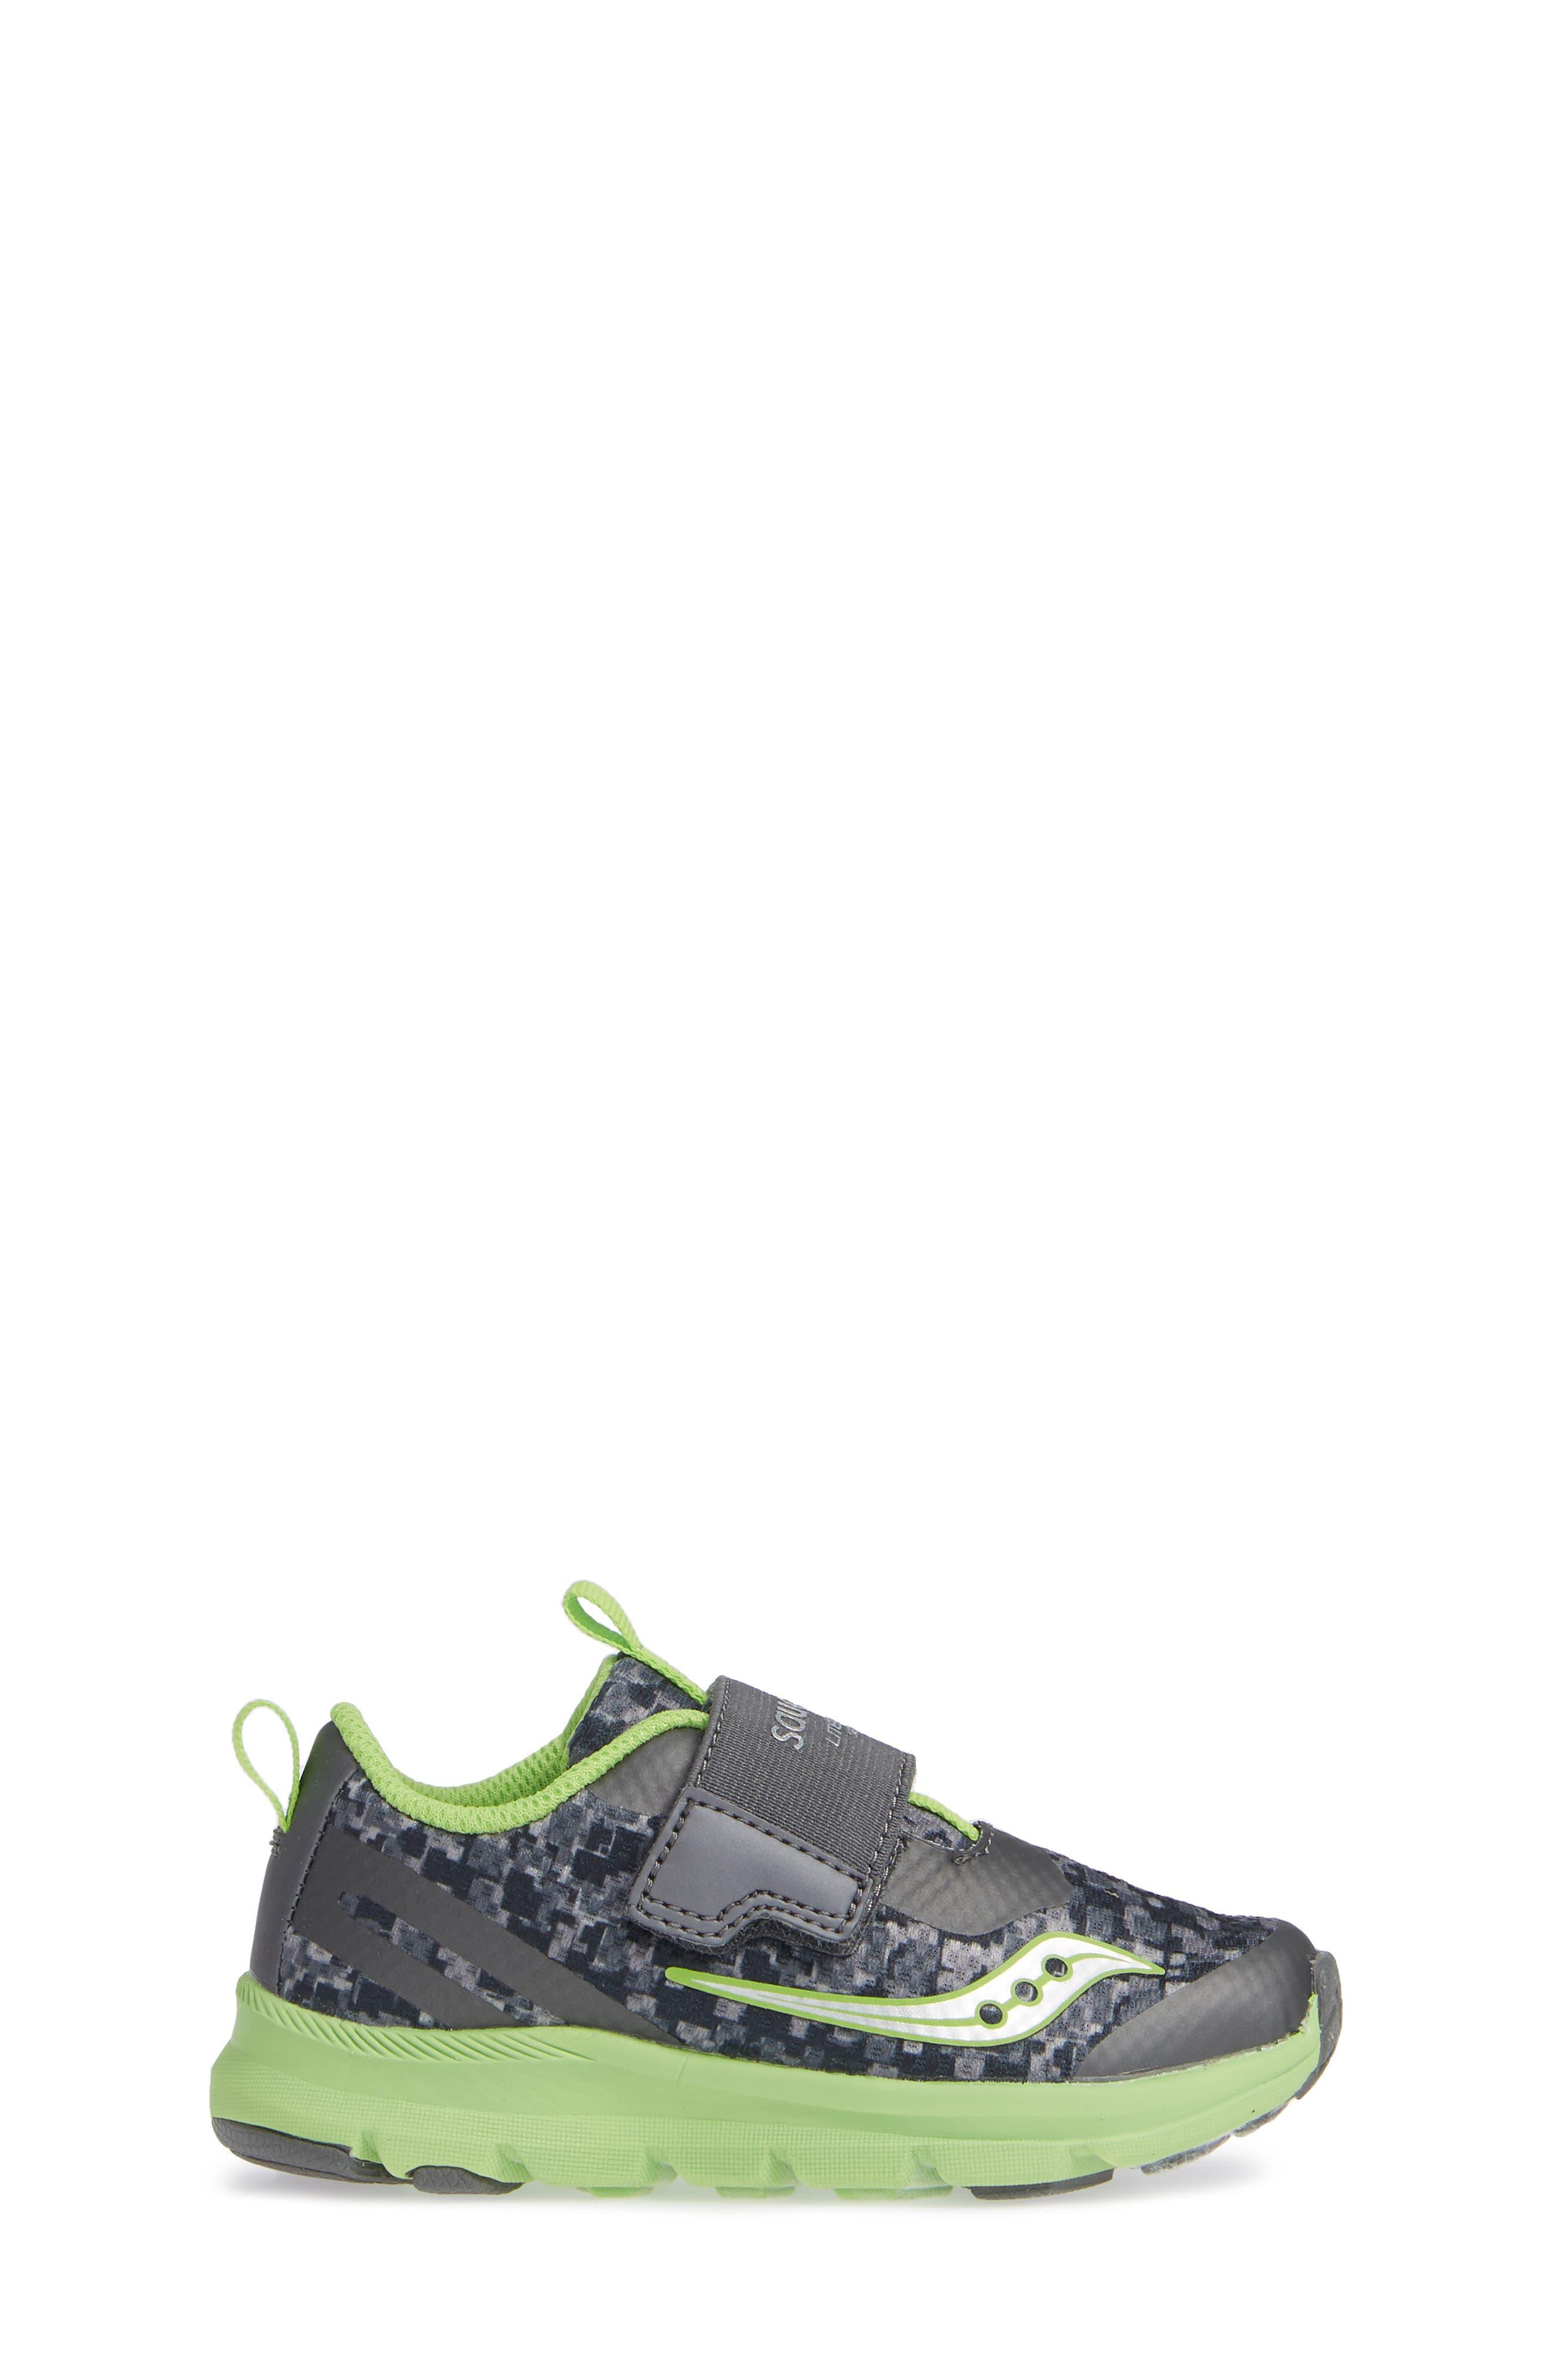 Baby Liteform Sneaker,                             Alternate thumbnail 3, color,                             GREY/ GREEN